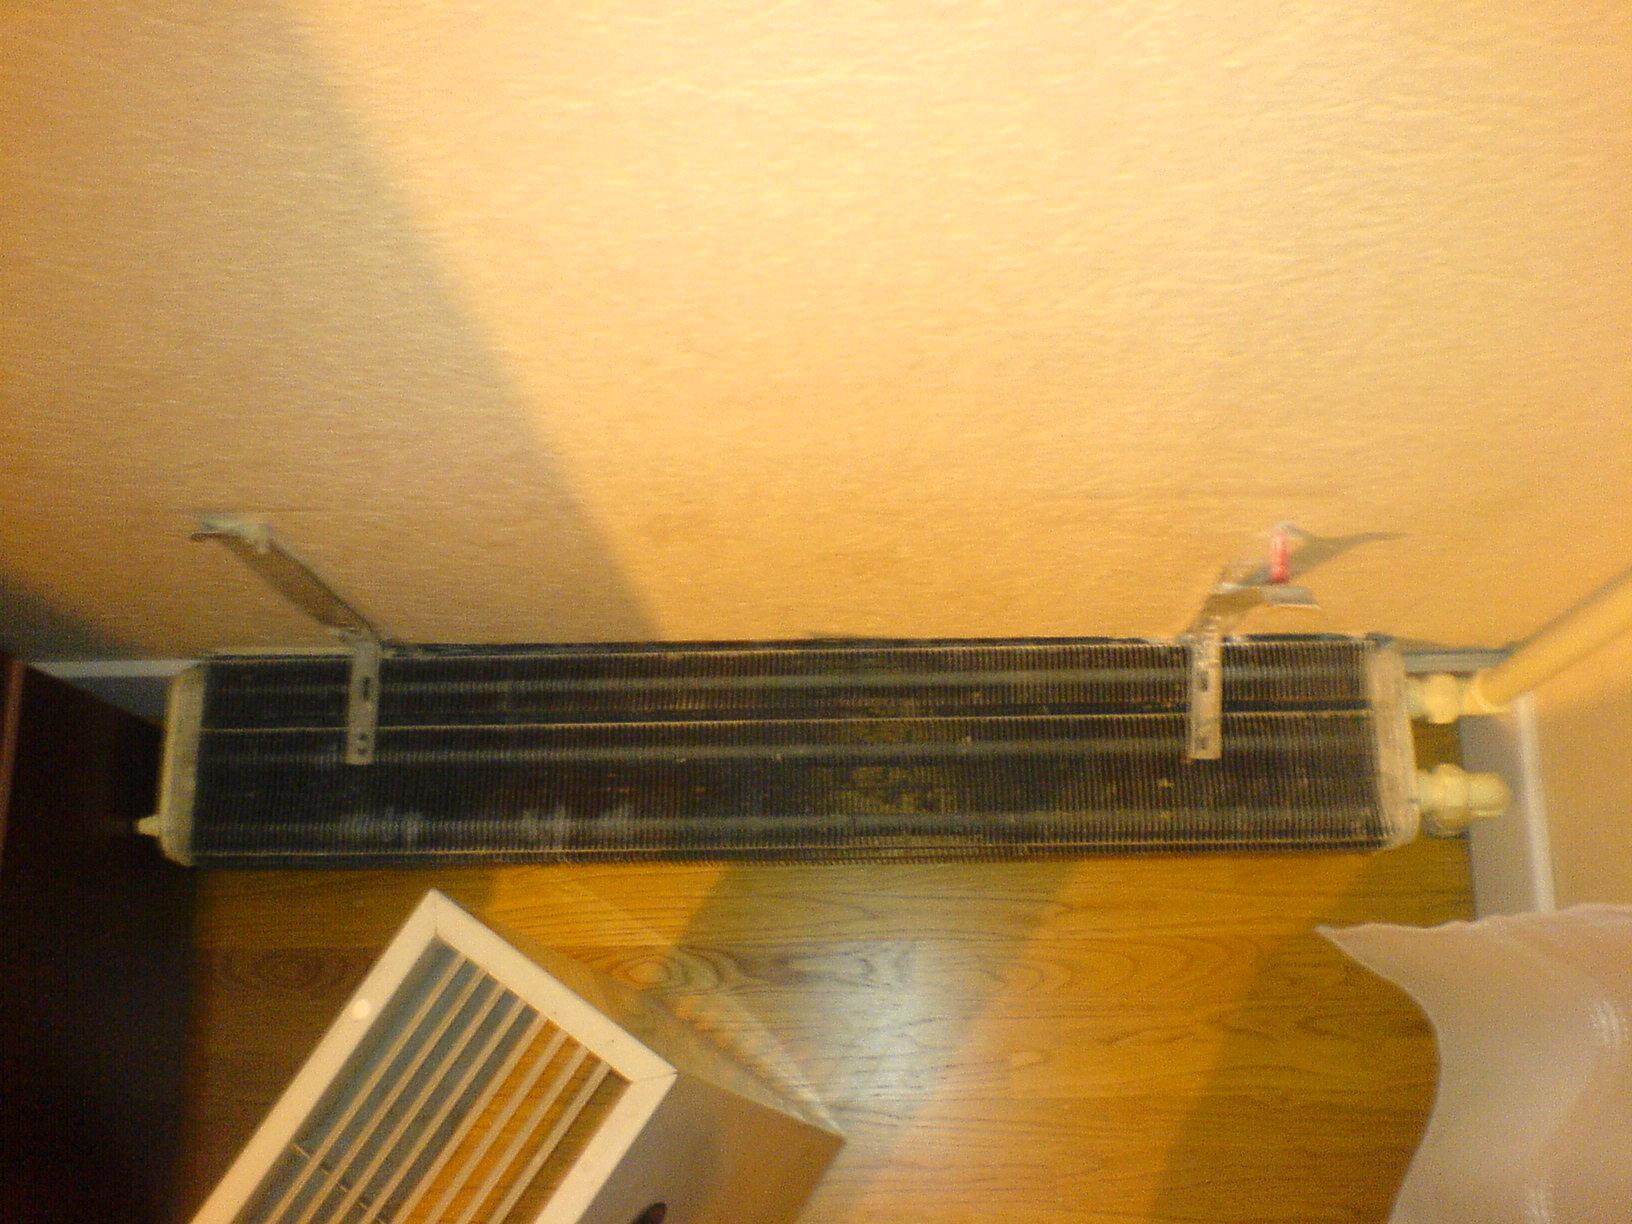 bruit metallique dans radiateur. Black Bedroom Furniture Sets. Home Design Ideas